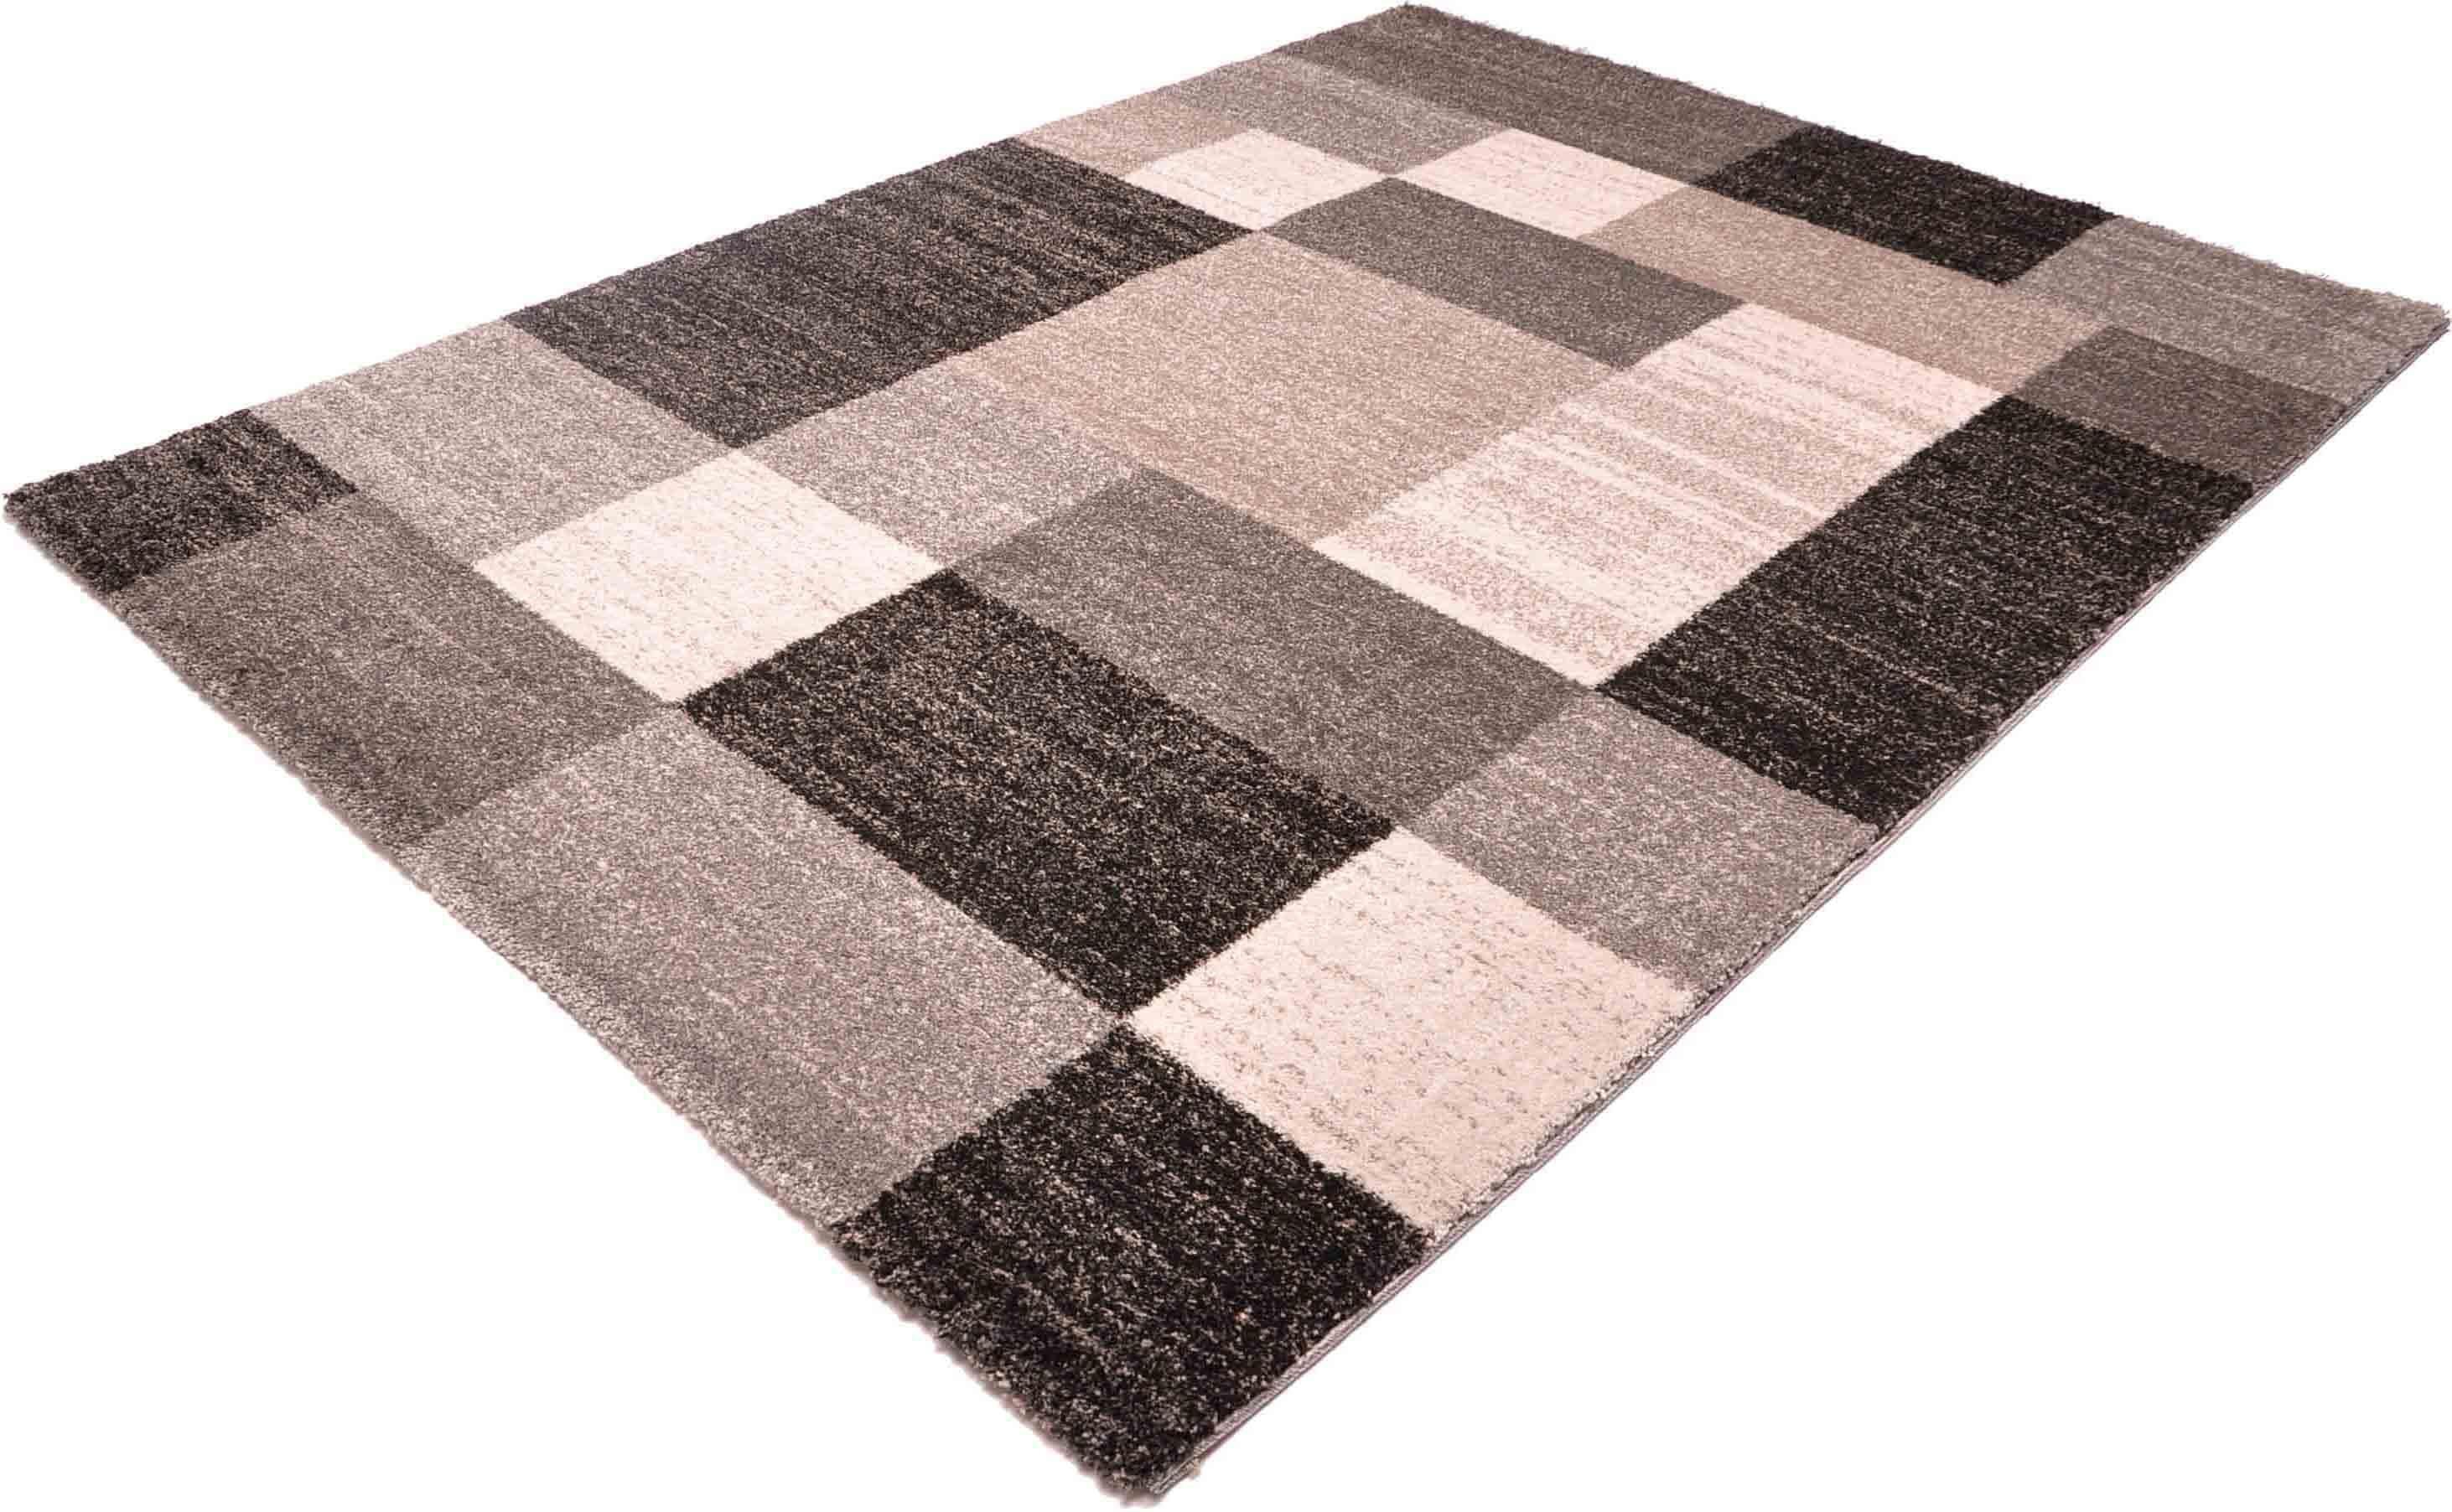 Böing Carpet vloerkleed Gabeh 1002 Patchwork, Gabeh design, woonkamer - gratis ruilen op otto.nl